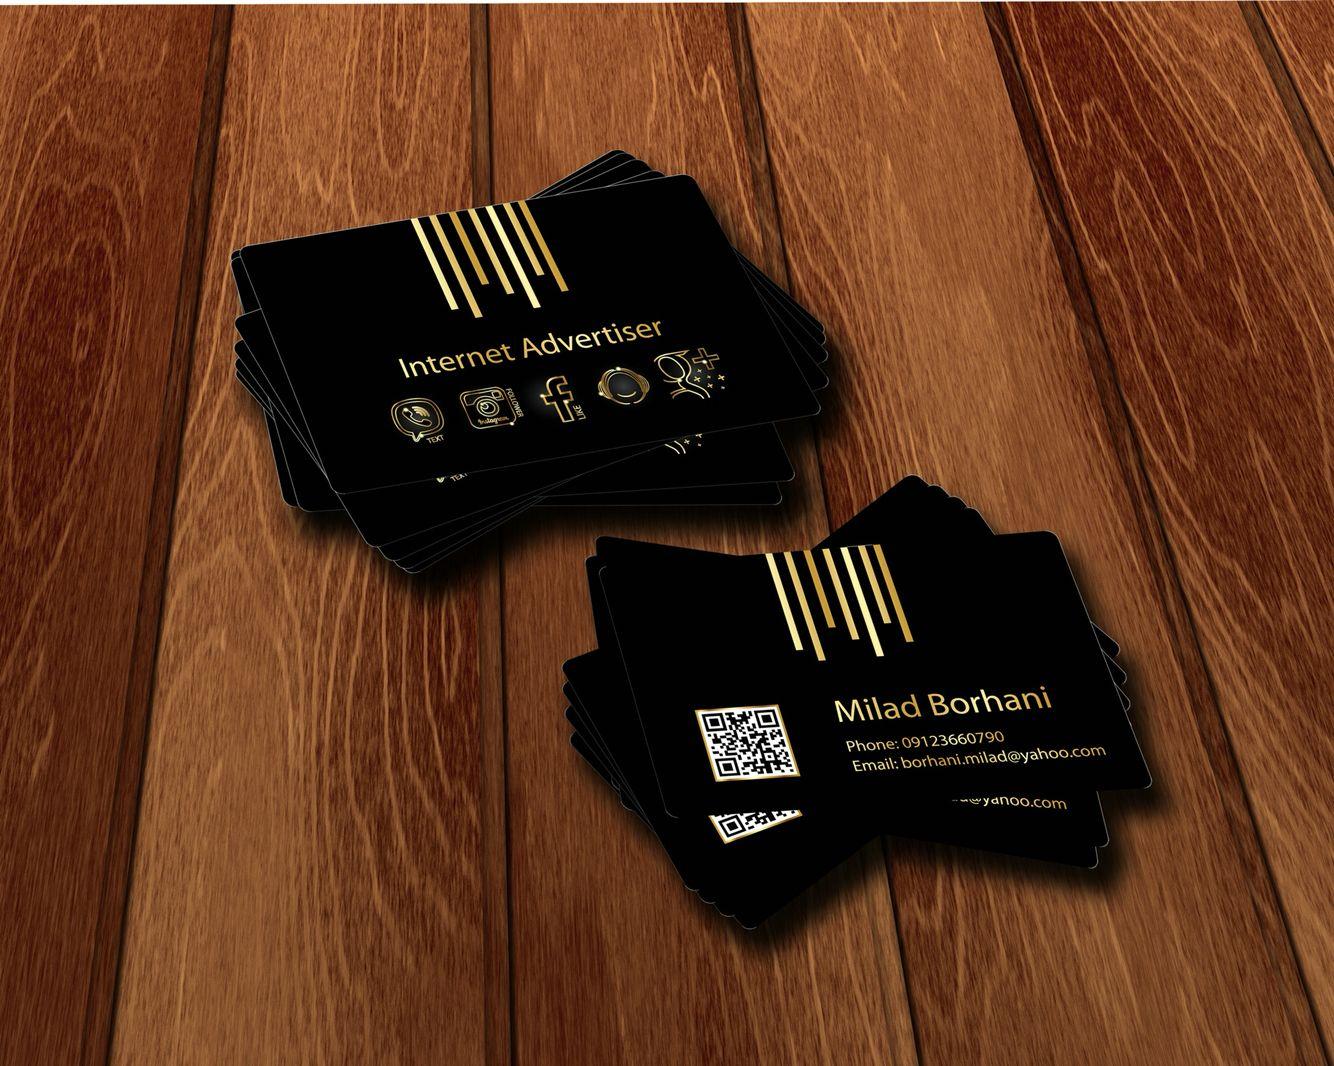 Internet advertiser | Business card | Pinterest | Business cards